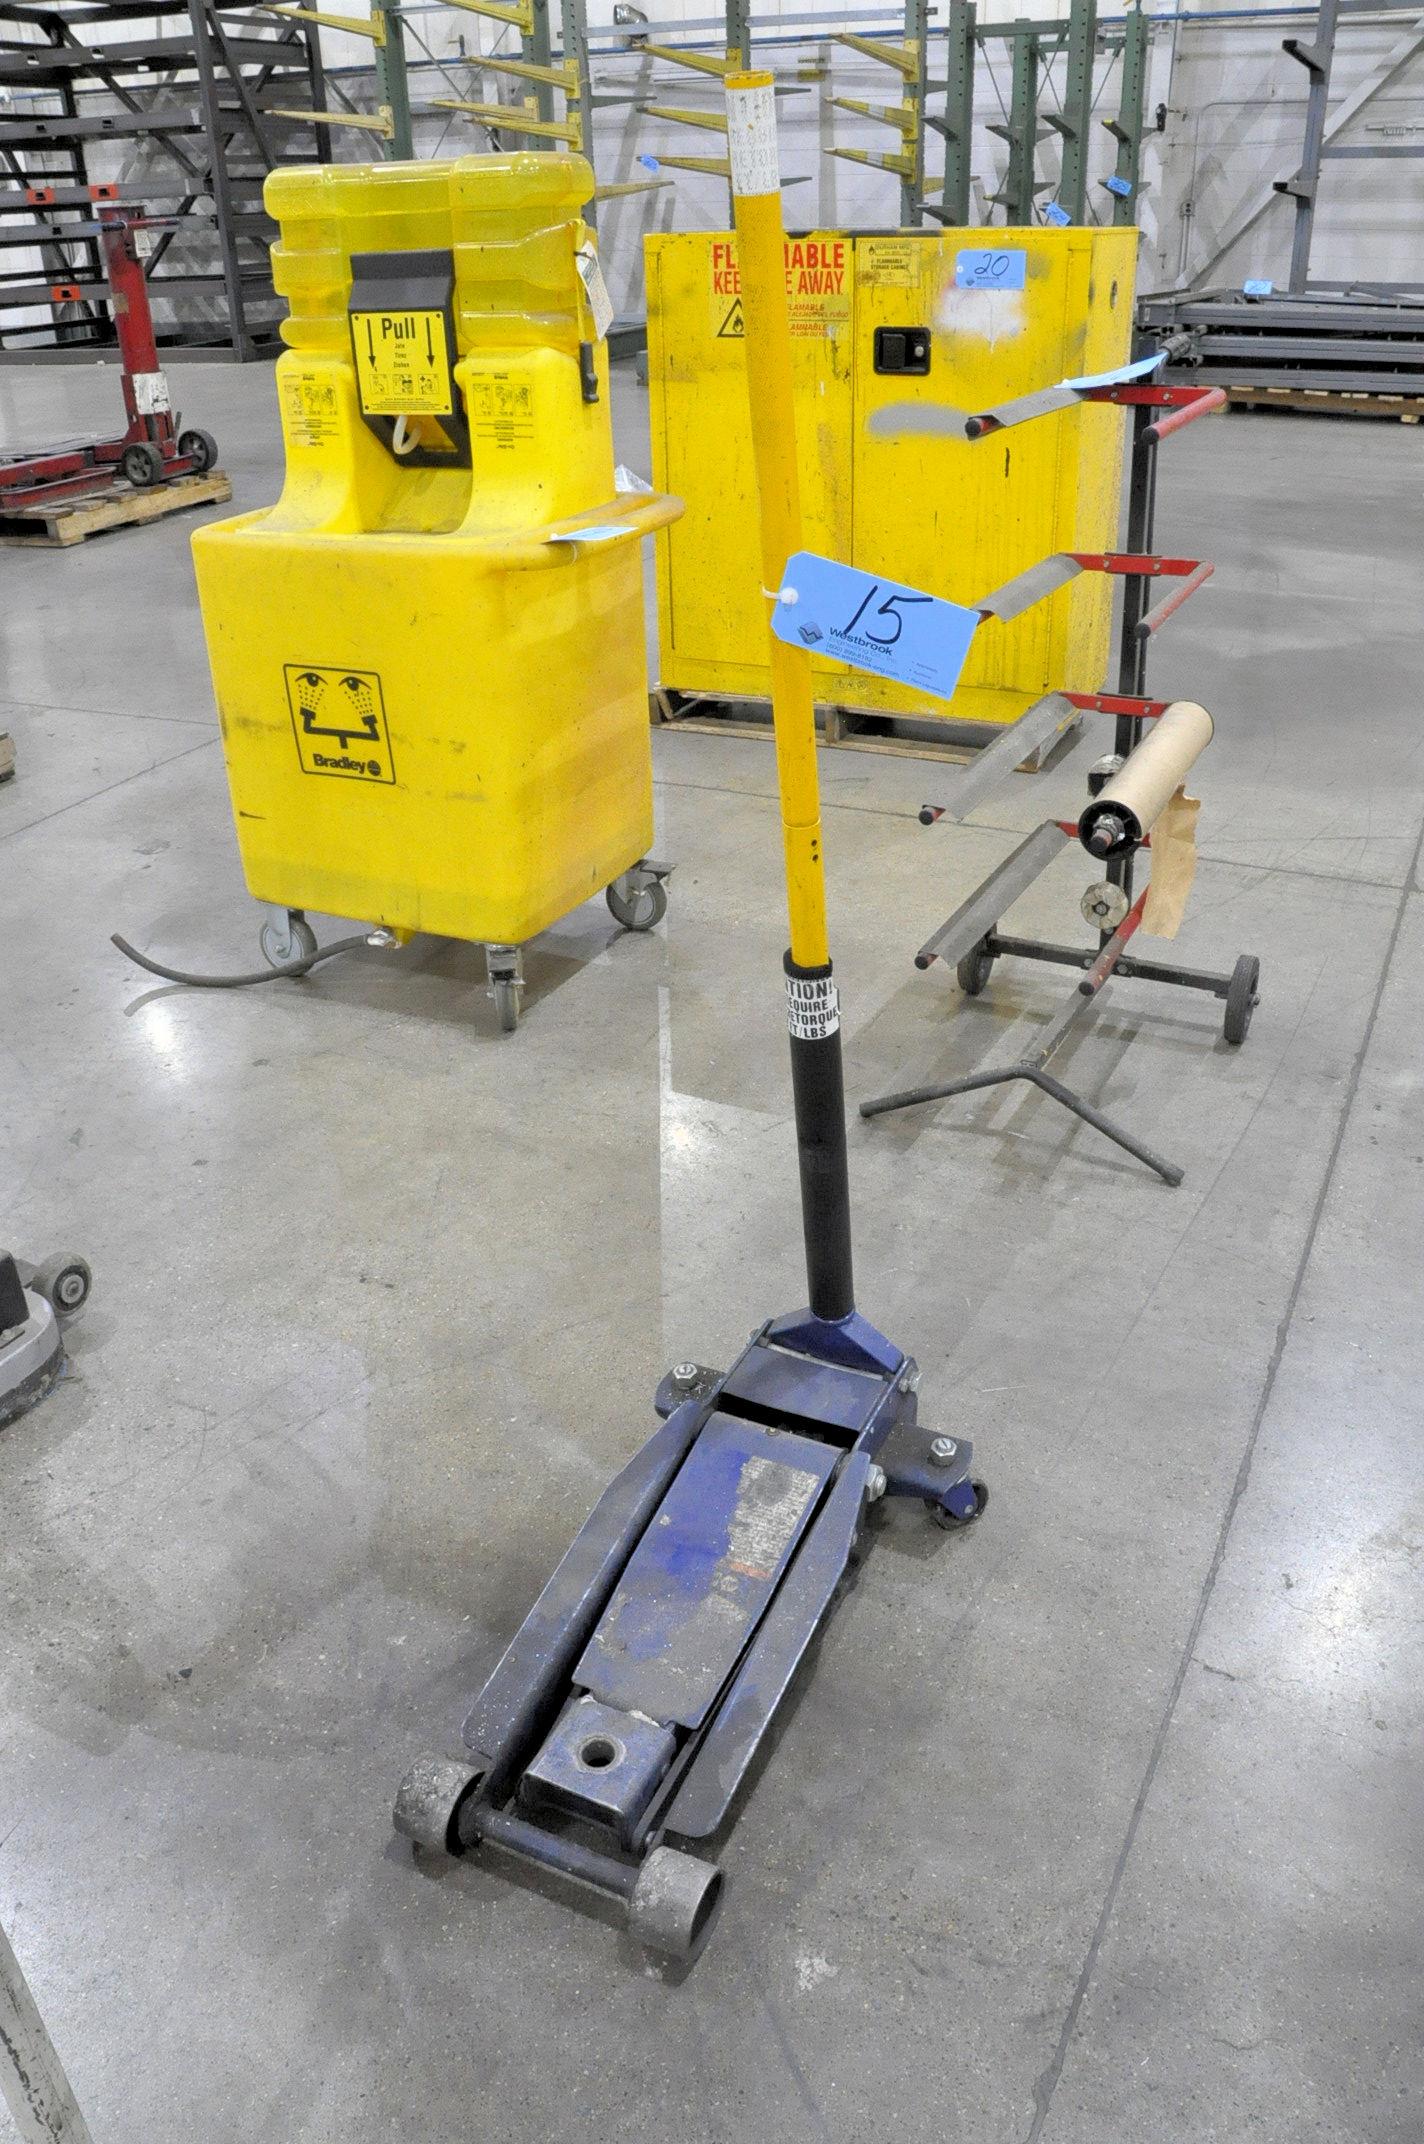 Approx. 2-Ton Capacity Hydraulic Floor Jack